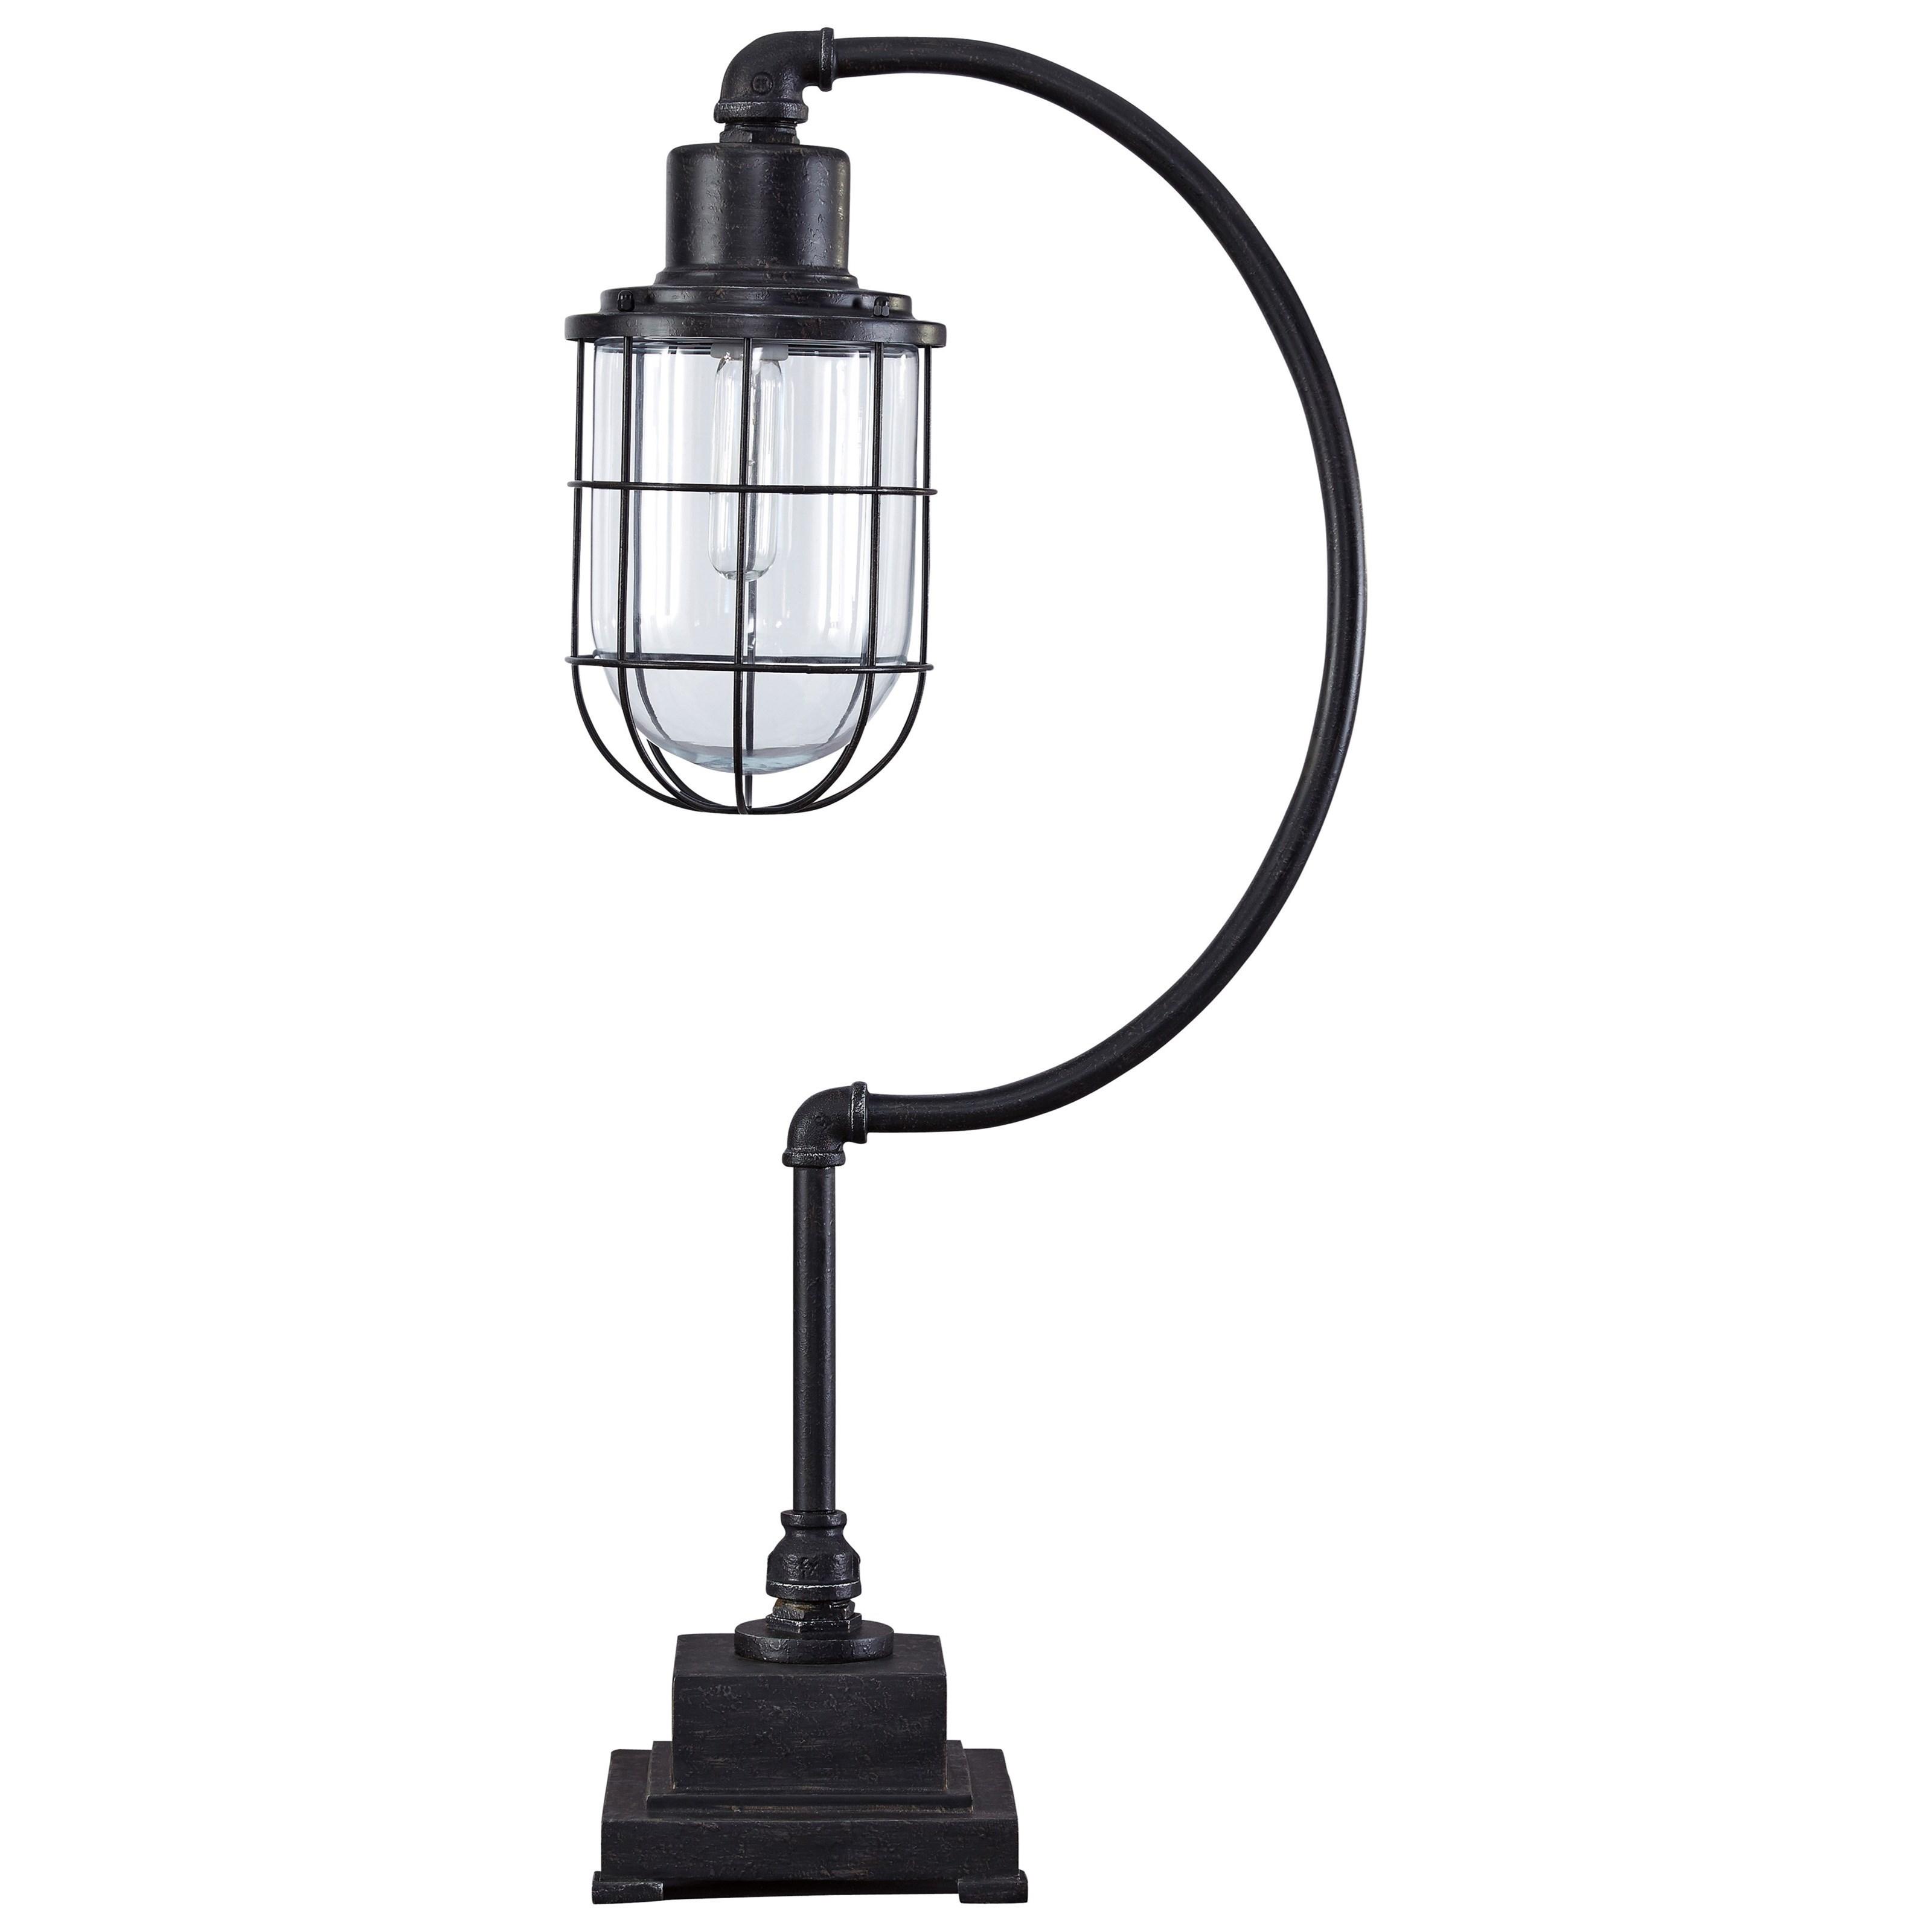 Jae Antique Black Metal Desk Lamp